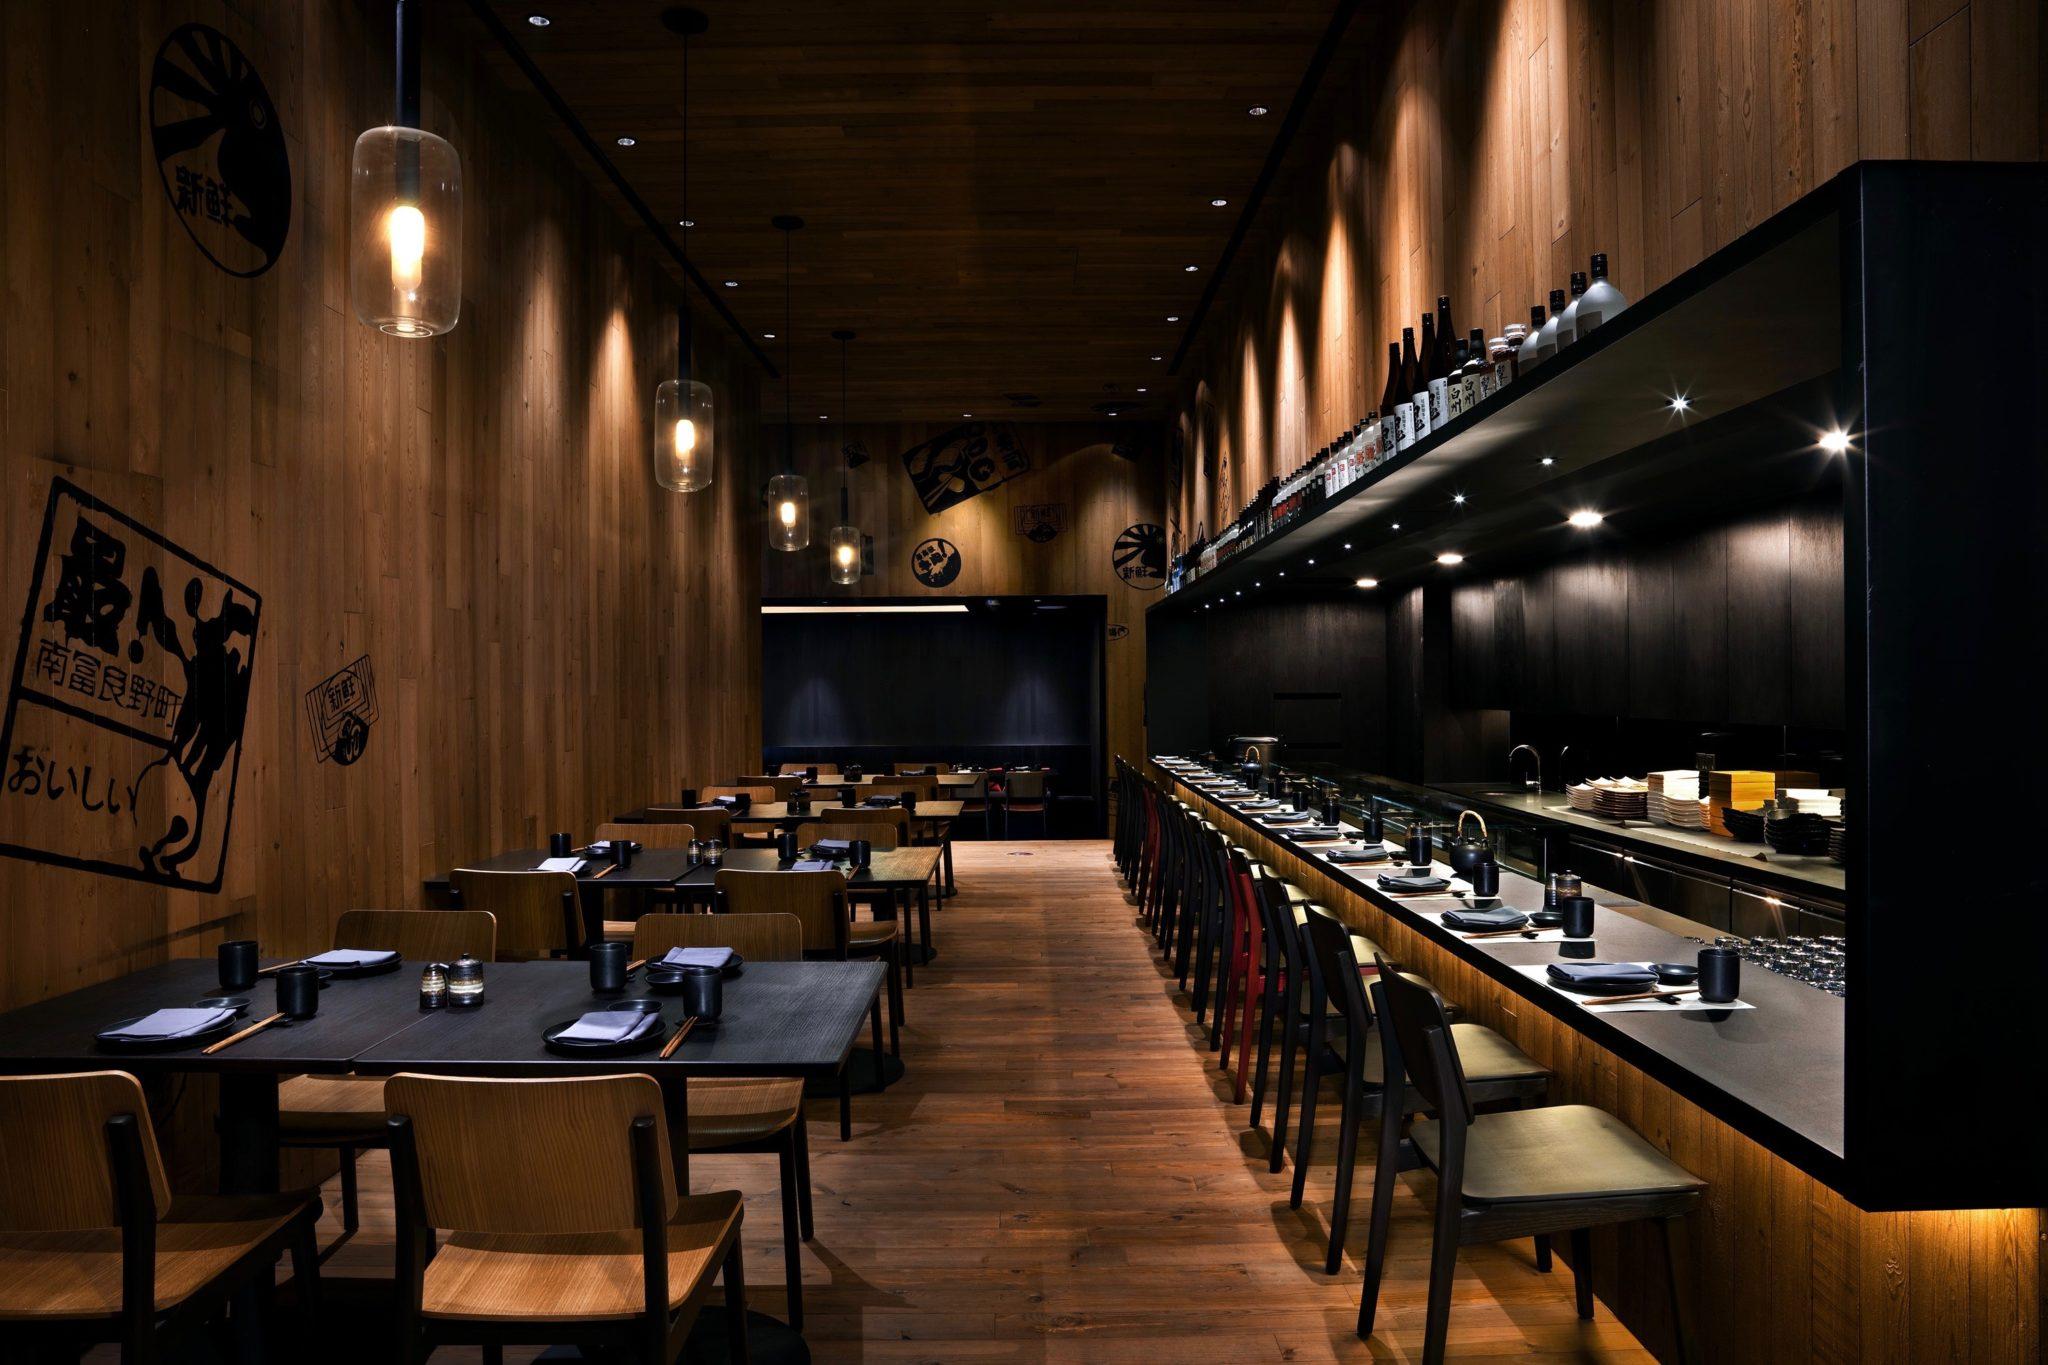 EAST Hotel Peking: Hier gibt's leckeres japanisches Essen